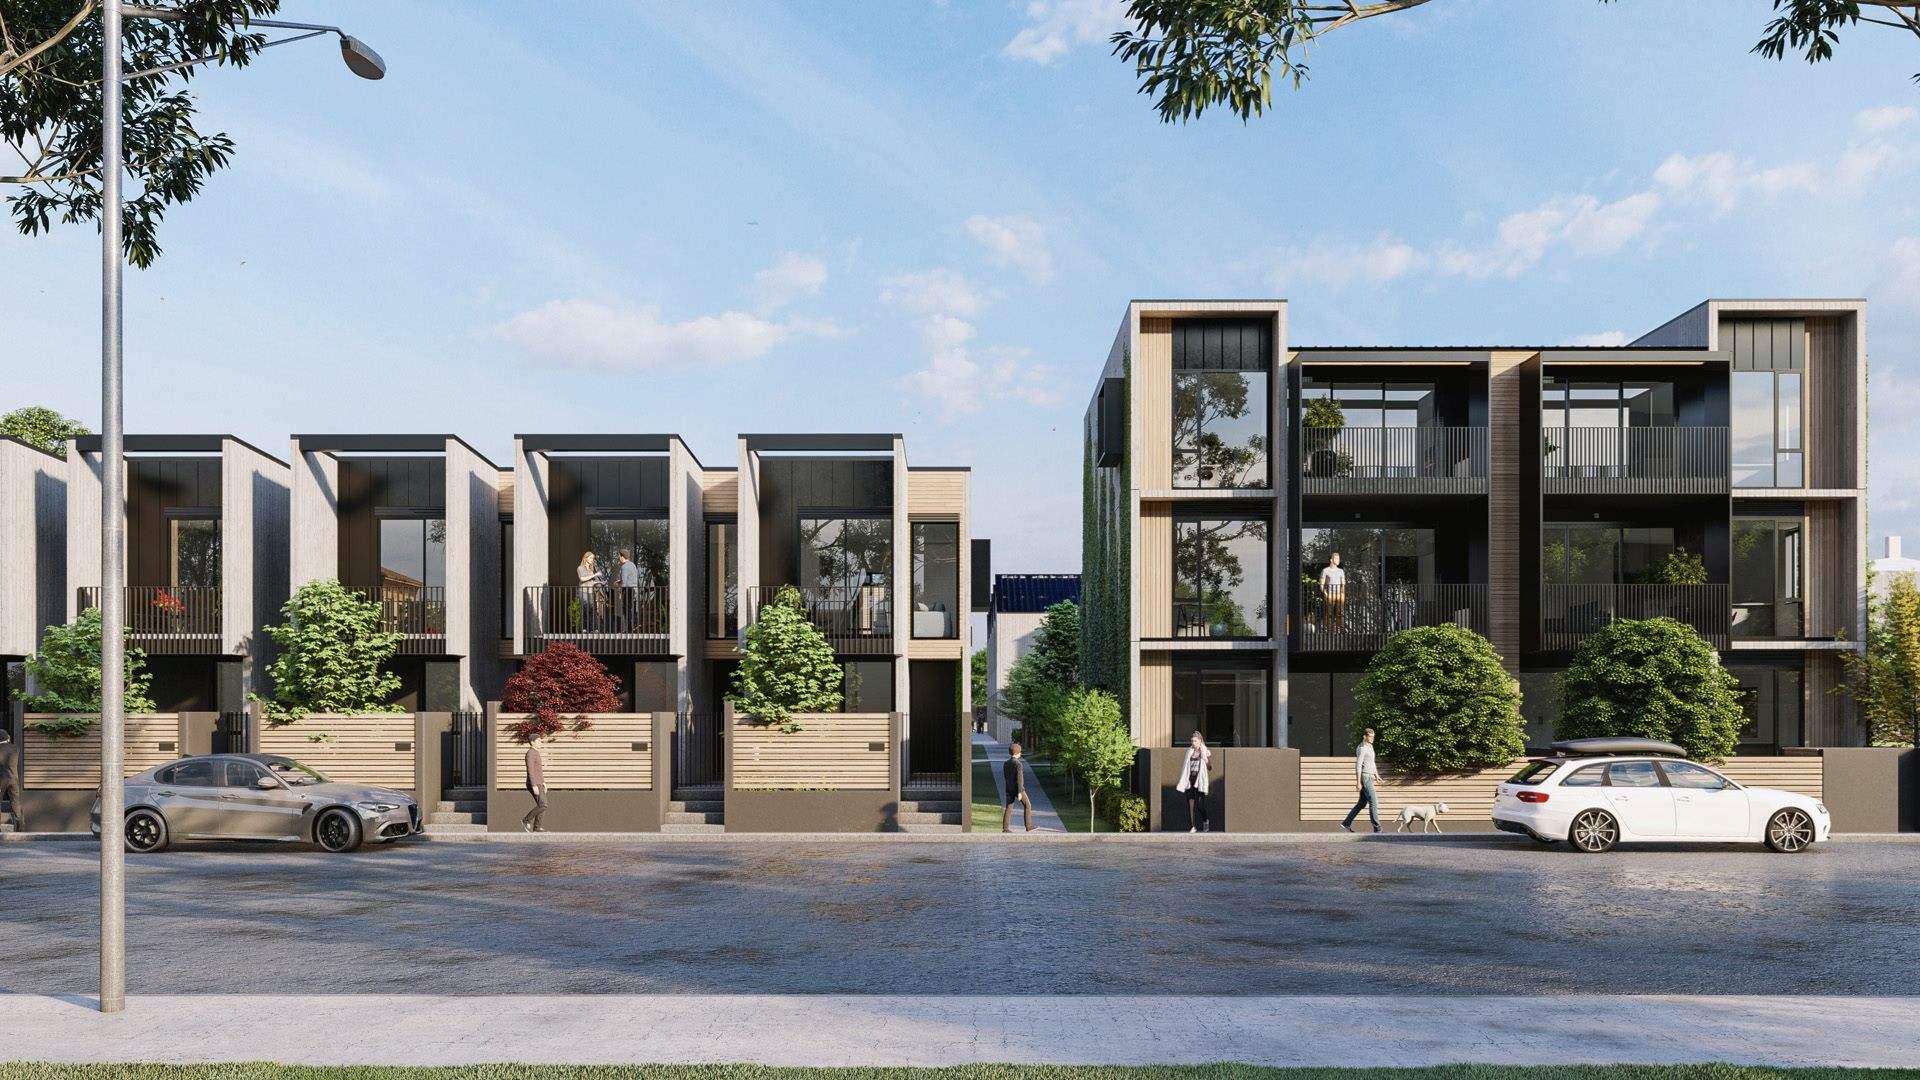 Christchurch Central 2房 高品质阳光新寓 鸟瞰Rauora公园风光 2022年秋竣工 上班族&小户型买家必看! Worcester Terraces -2 Bedroom Apartment